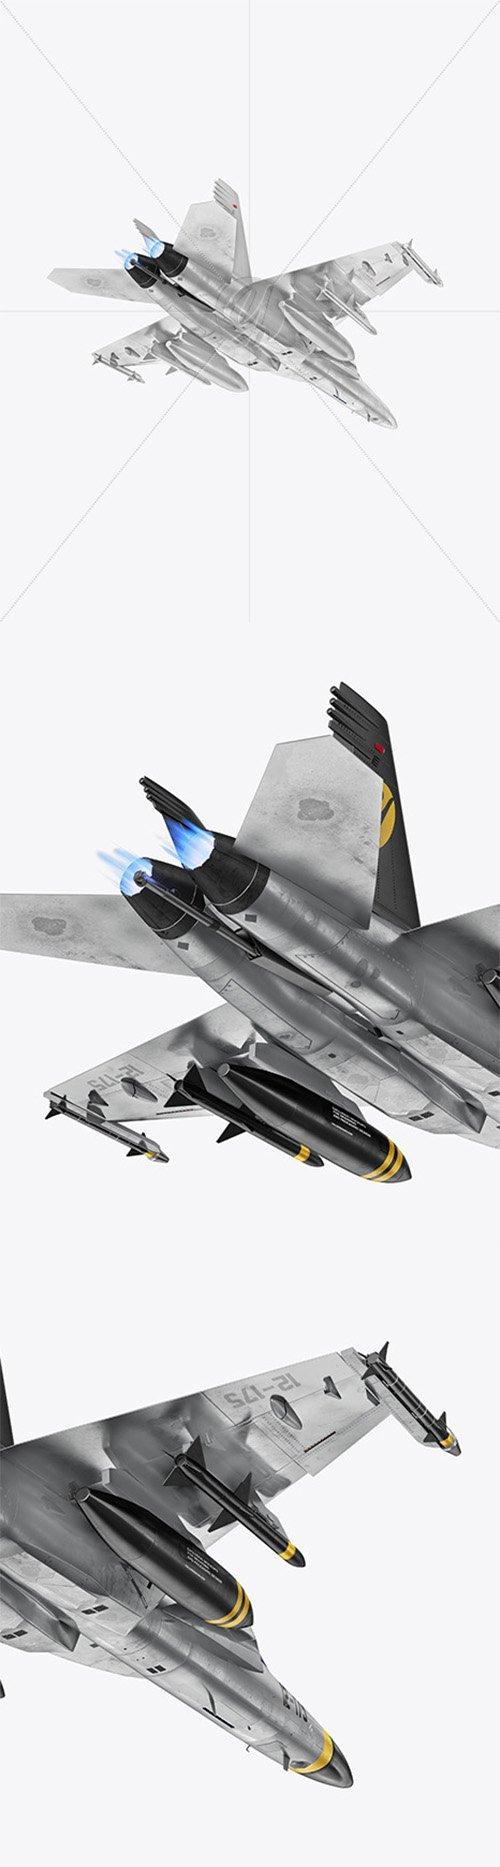 Combat Fighter - Back Half Side View (Hero Shot) 65125